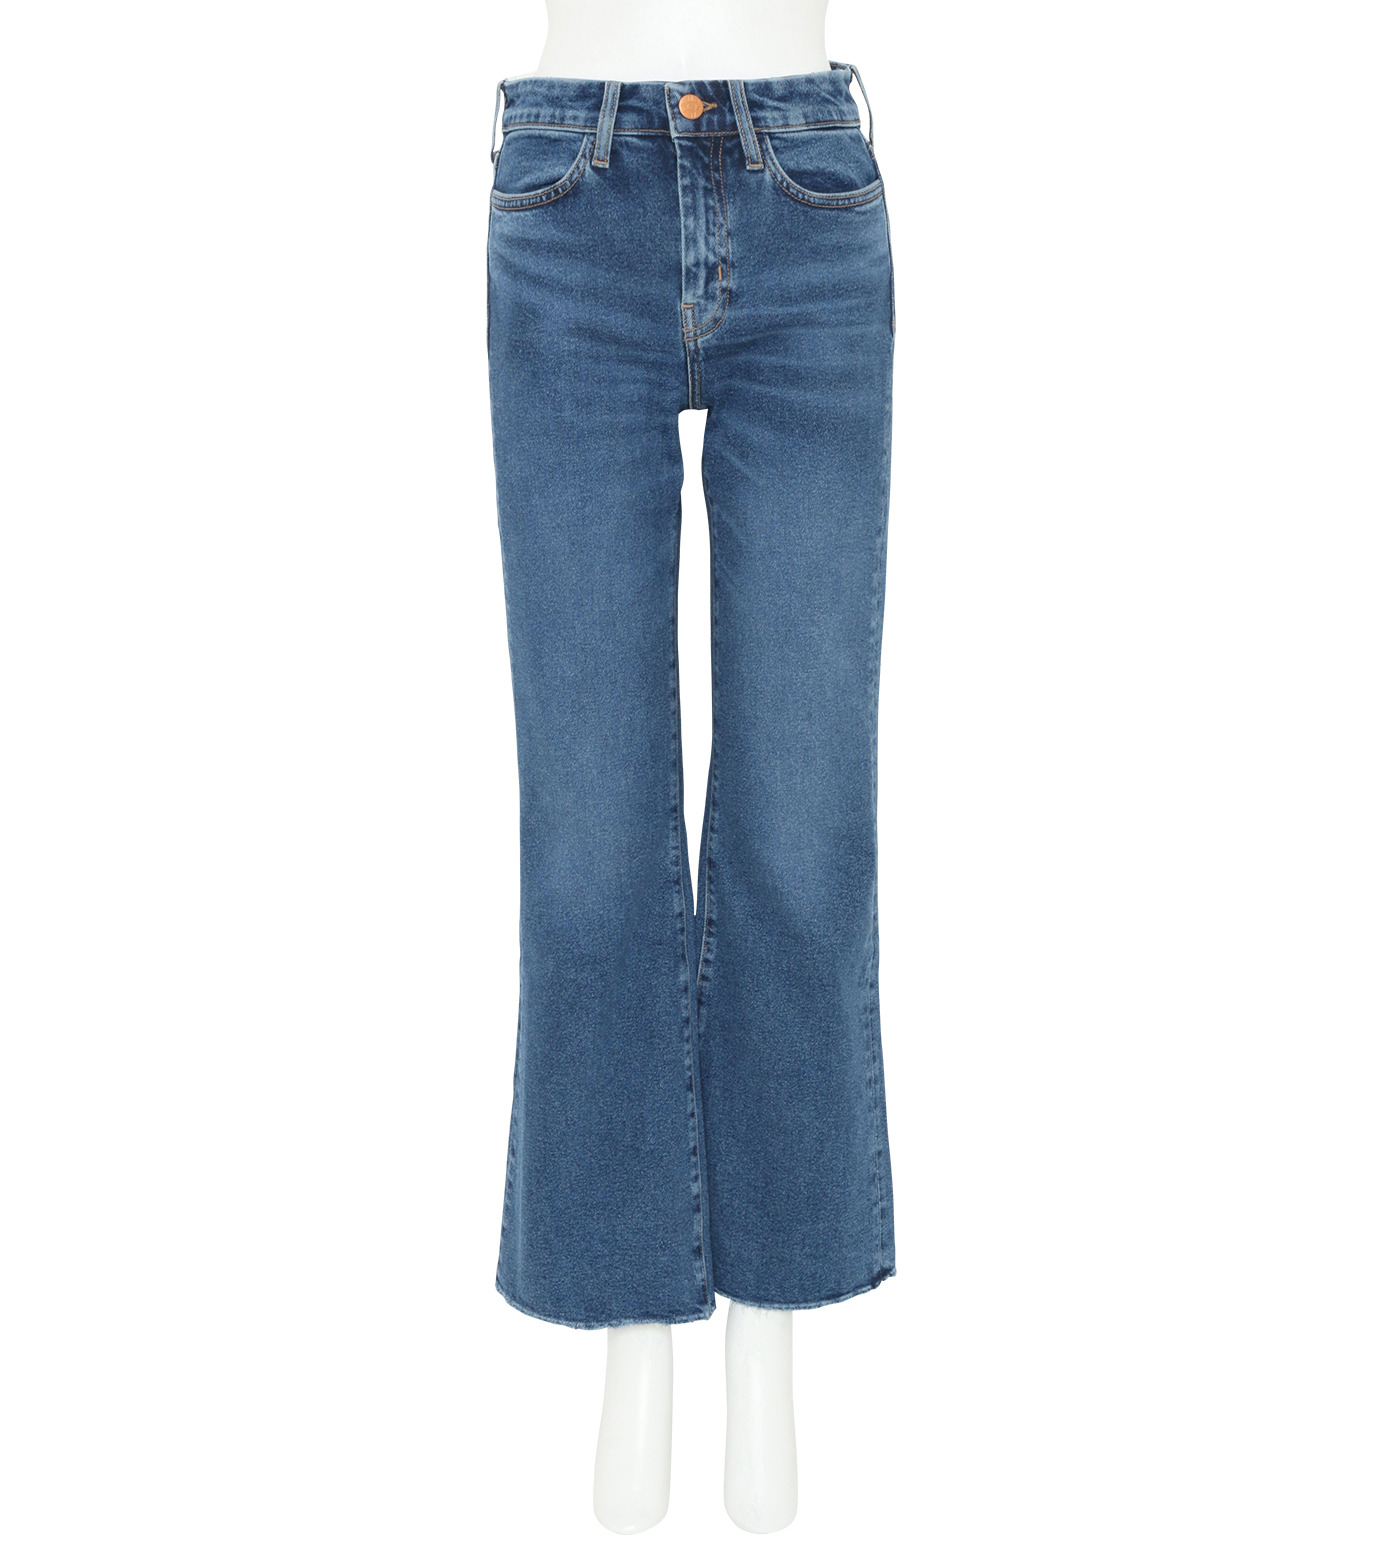 M.i.h Jeans(エムアイエイチジーンズ)のLou Flare Denim-LIGHT BLUE(デニム/denim)-W2102175-91 拡大詳細画像1